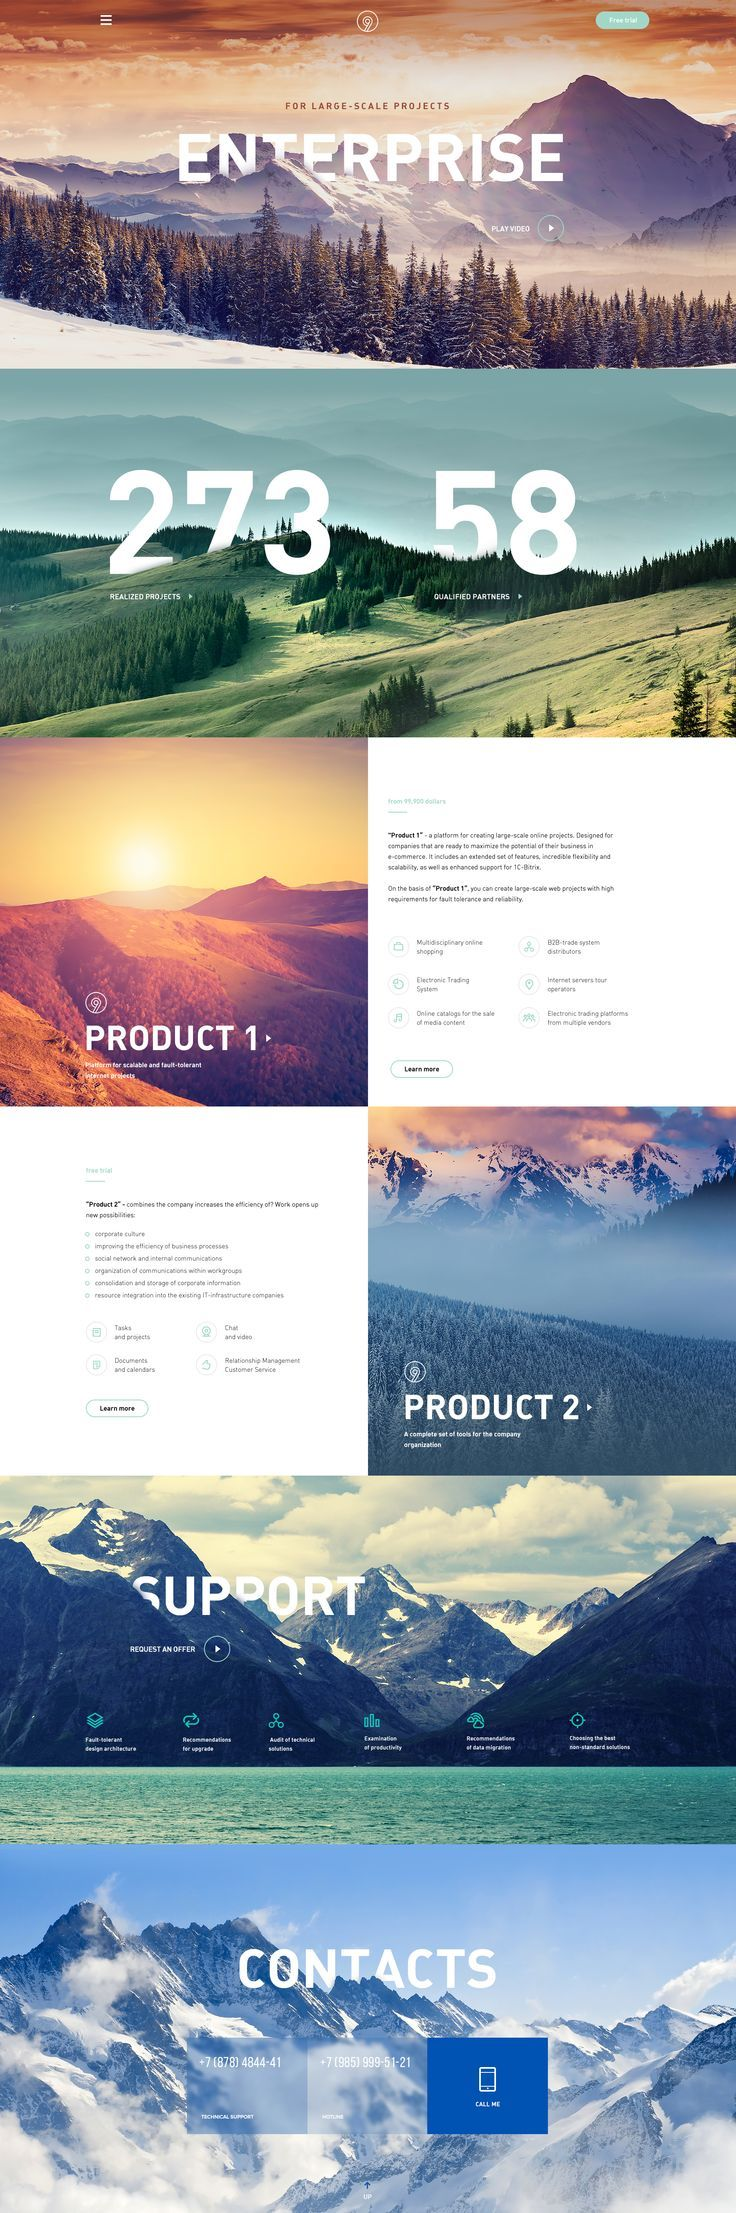 Concept of enterprise site by Nikolay Ivanov for AIC